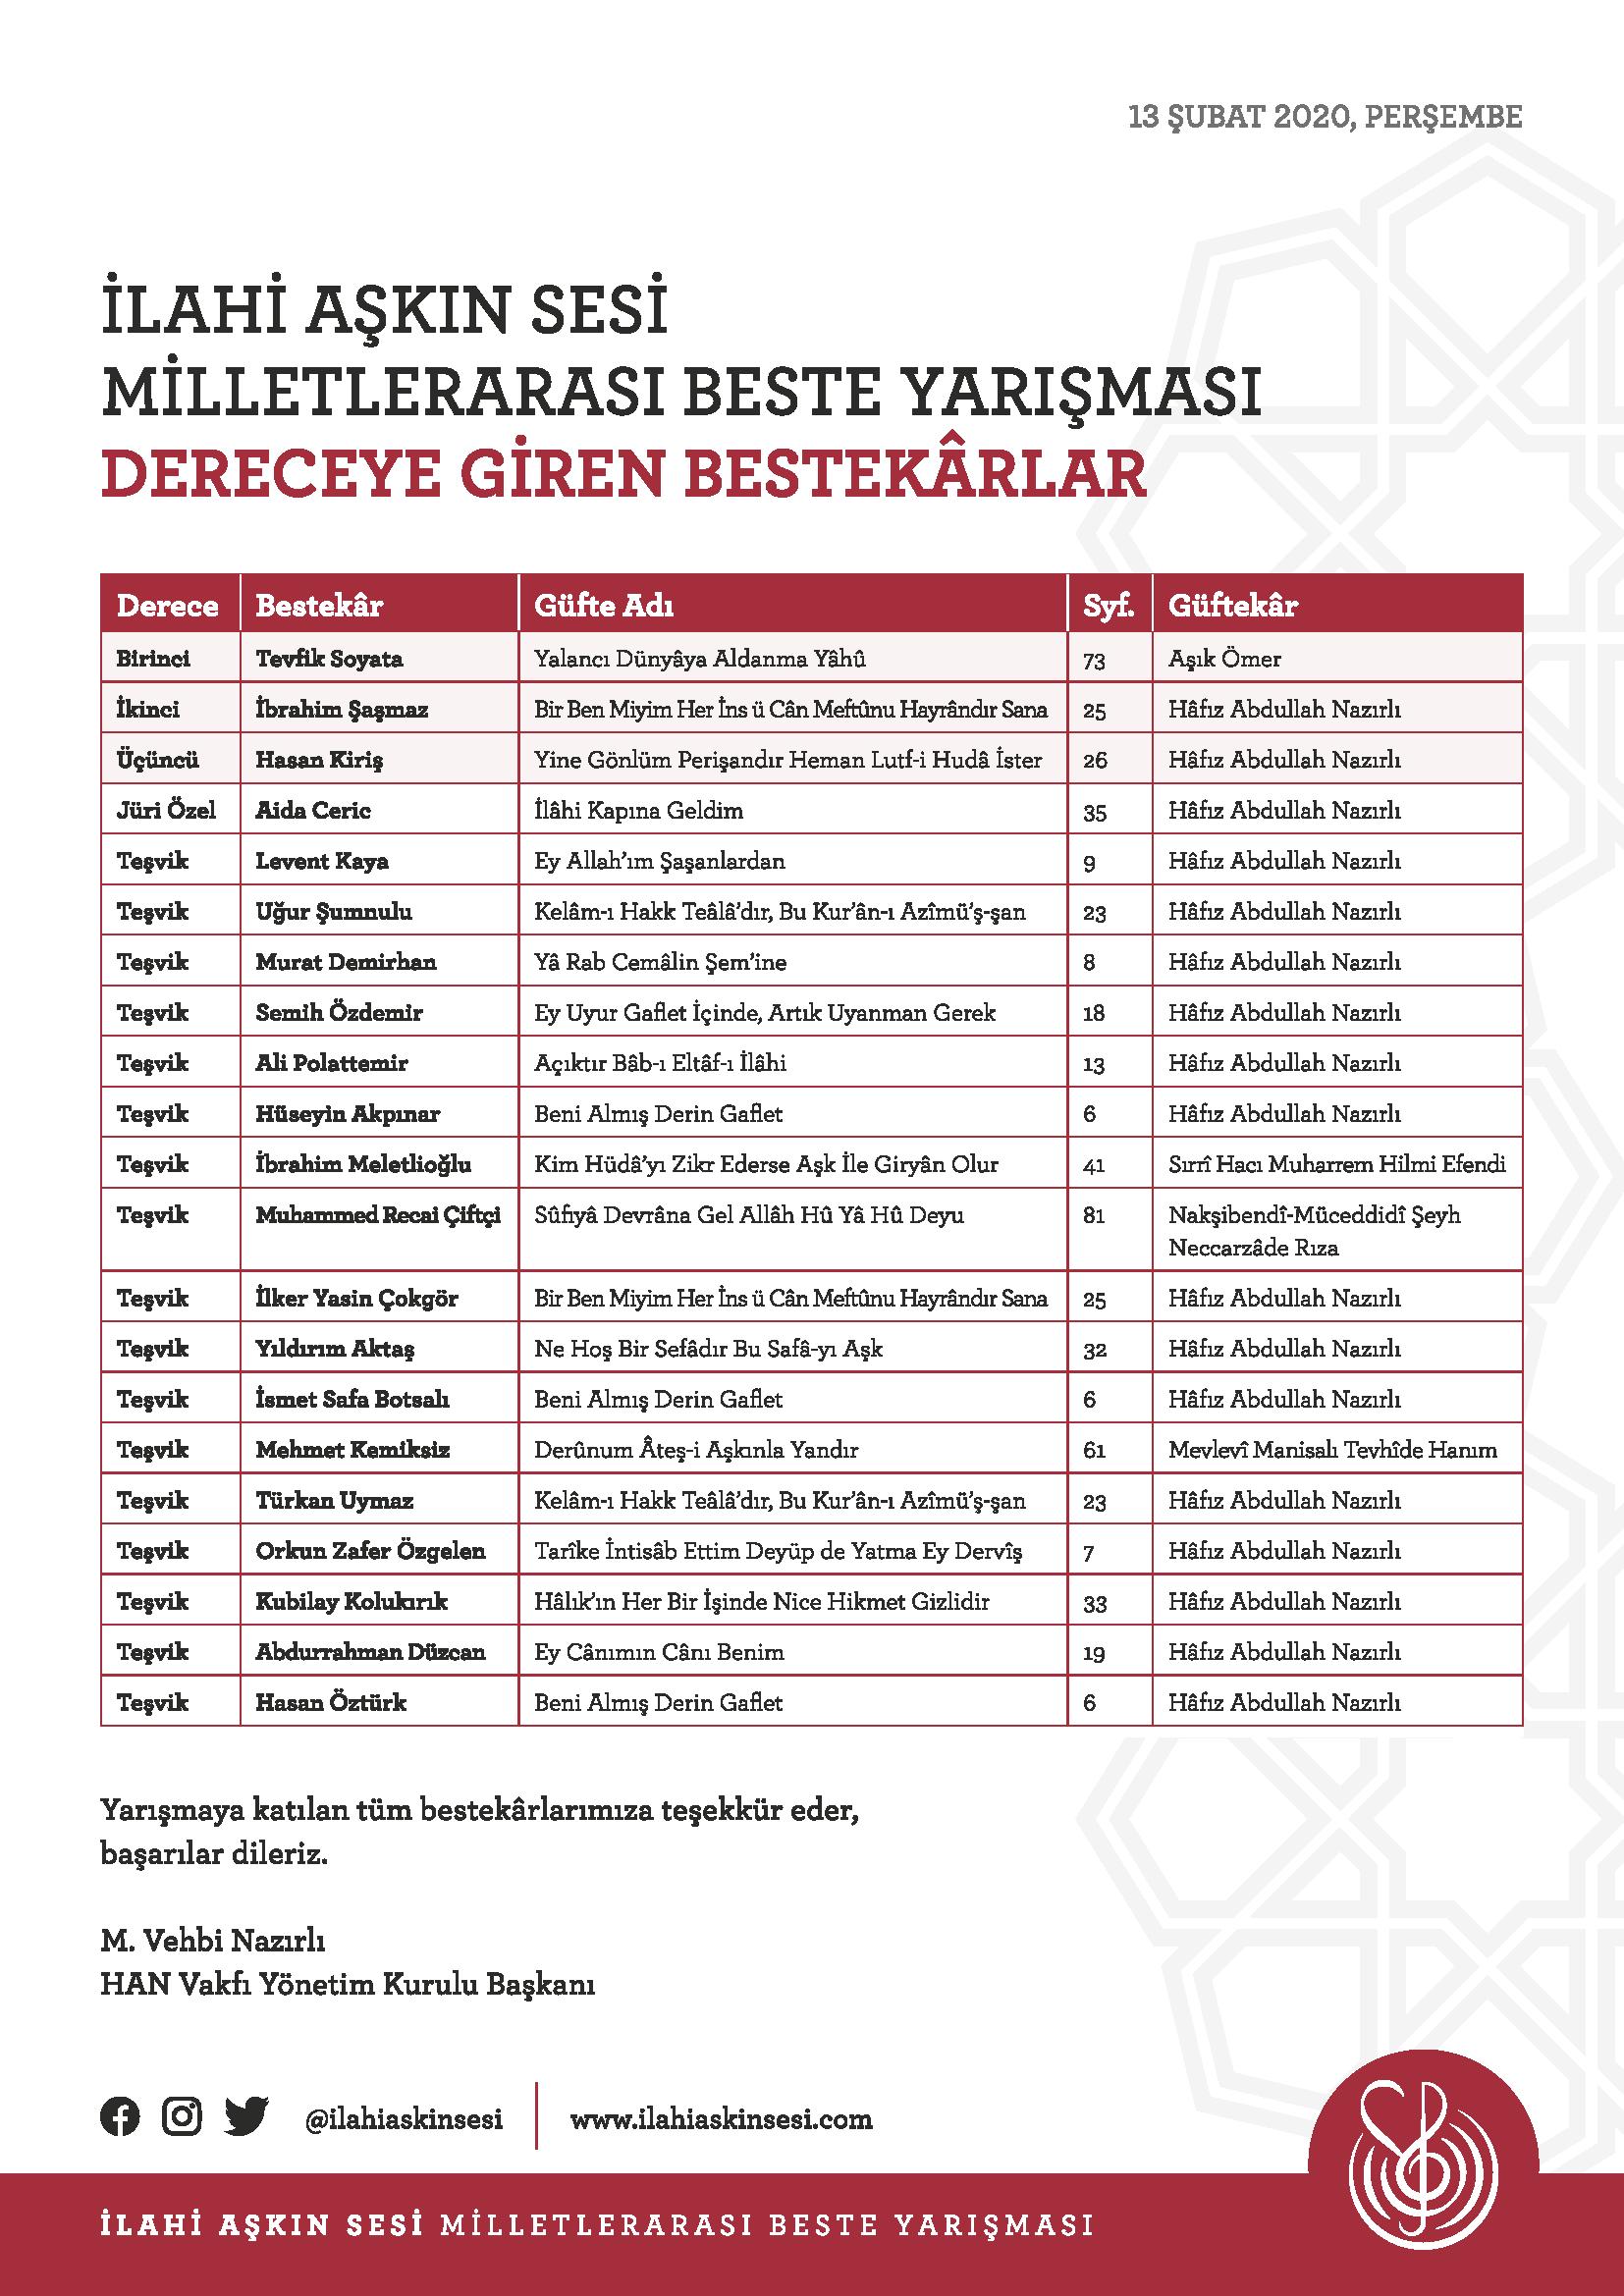 IAS_Dereceye_Giren_Bestekarlar_13_Subat_2020.pdf.png